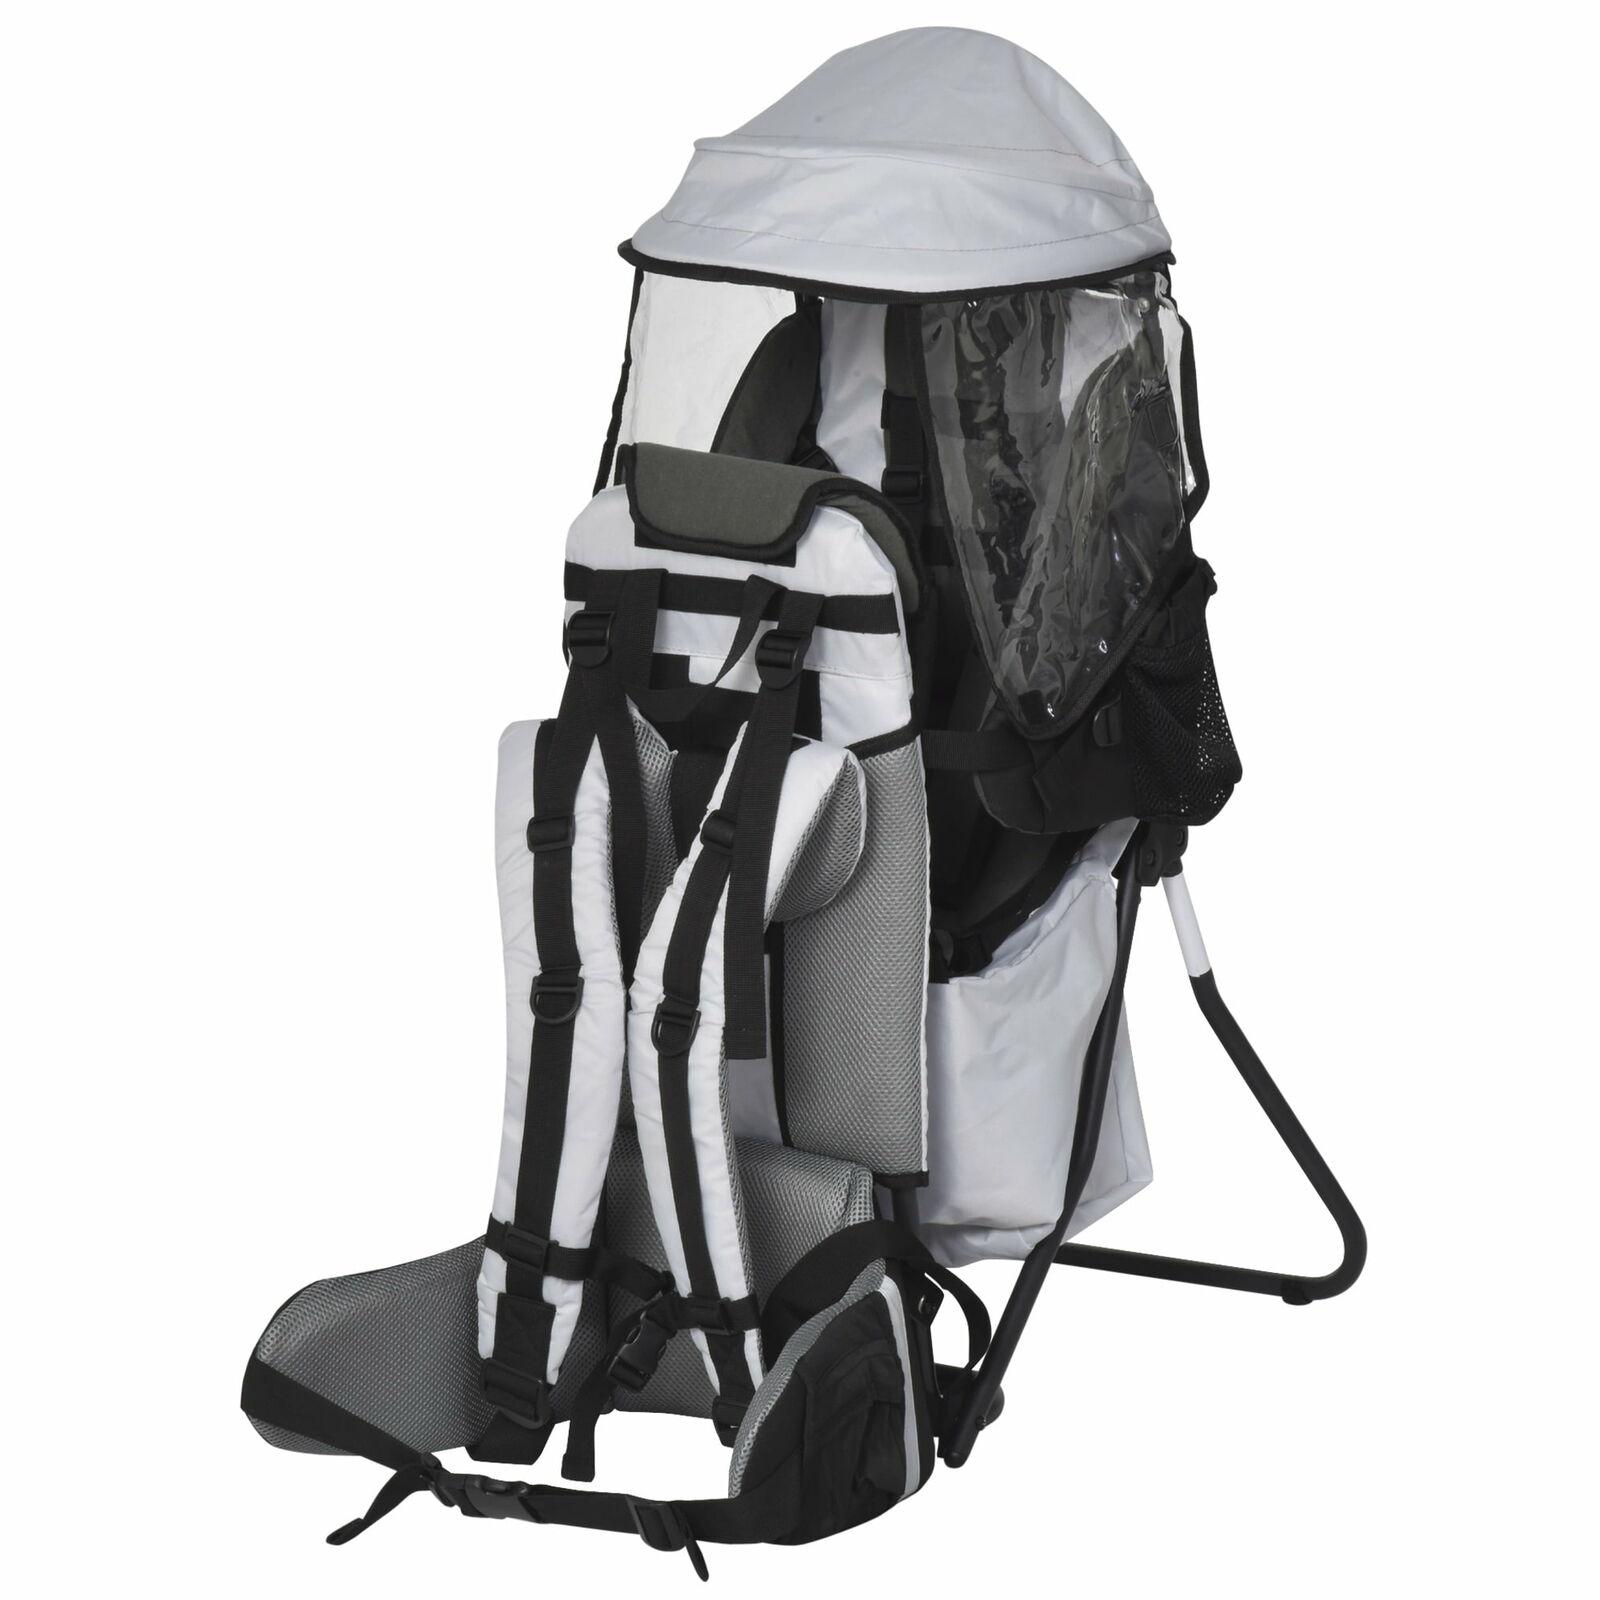 Rent baby carrier backpack Rimini